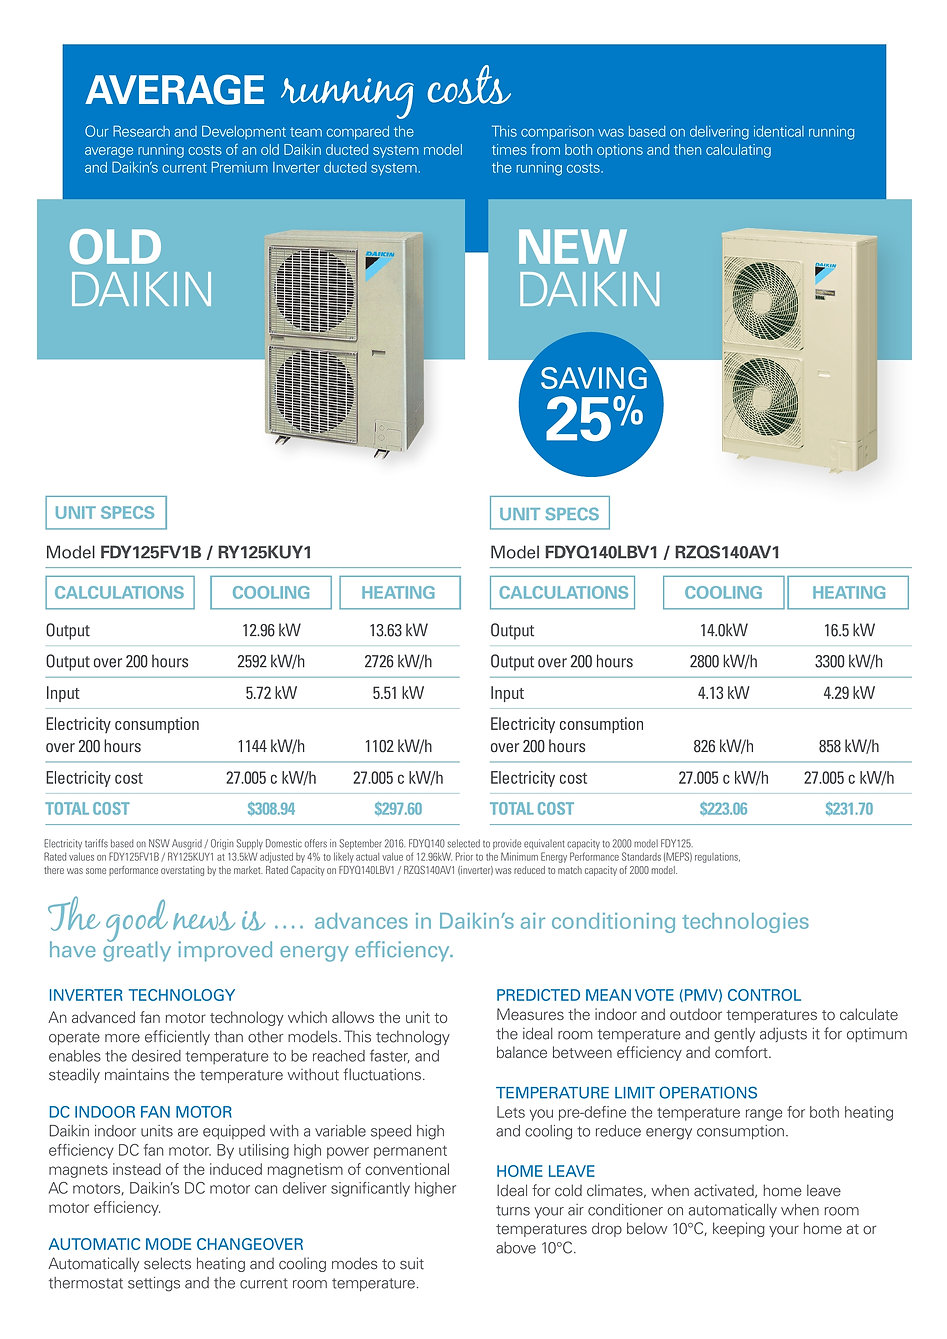 Daikin ducted replacement savings